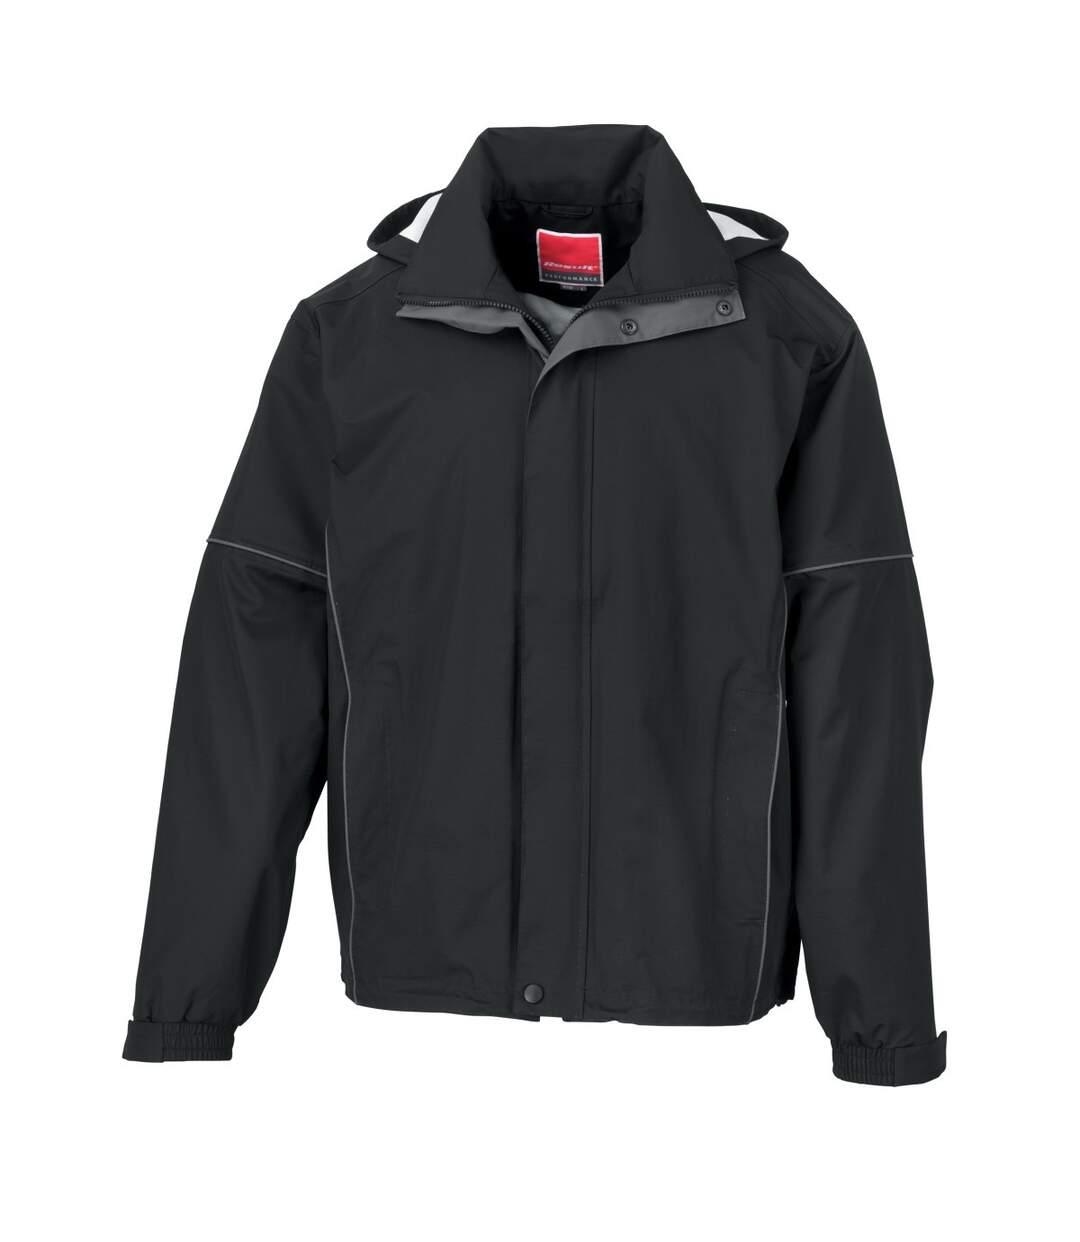 Result Mens Urban Outdoor Fell Lightweight Technical Jacket (Waterproof & Windproof) (Black) - UTBC3050